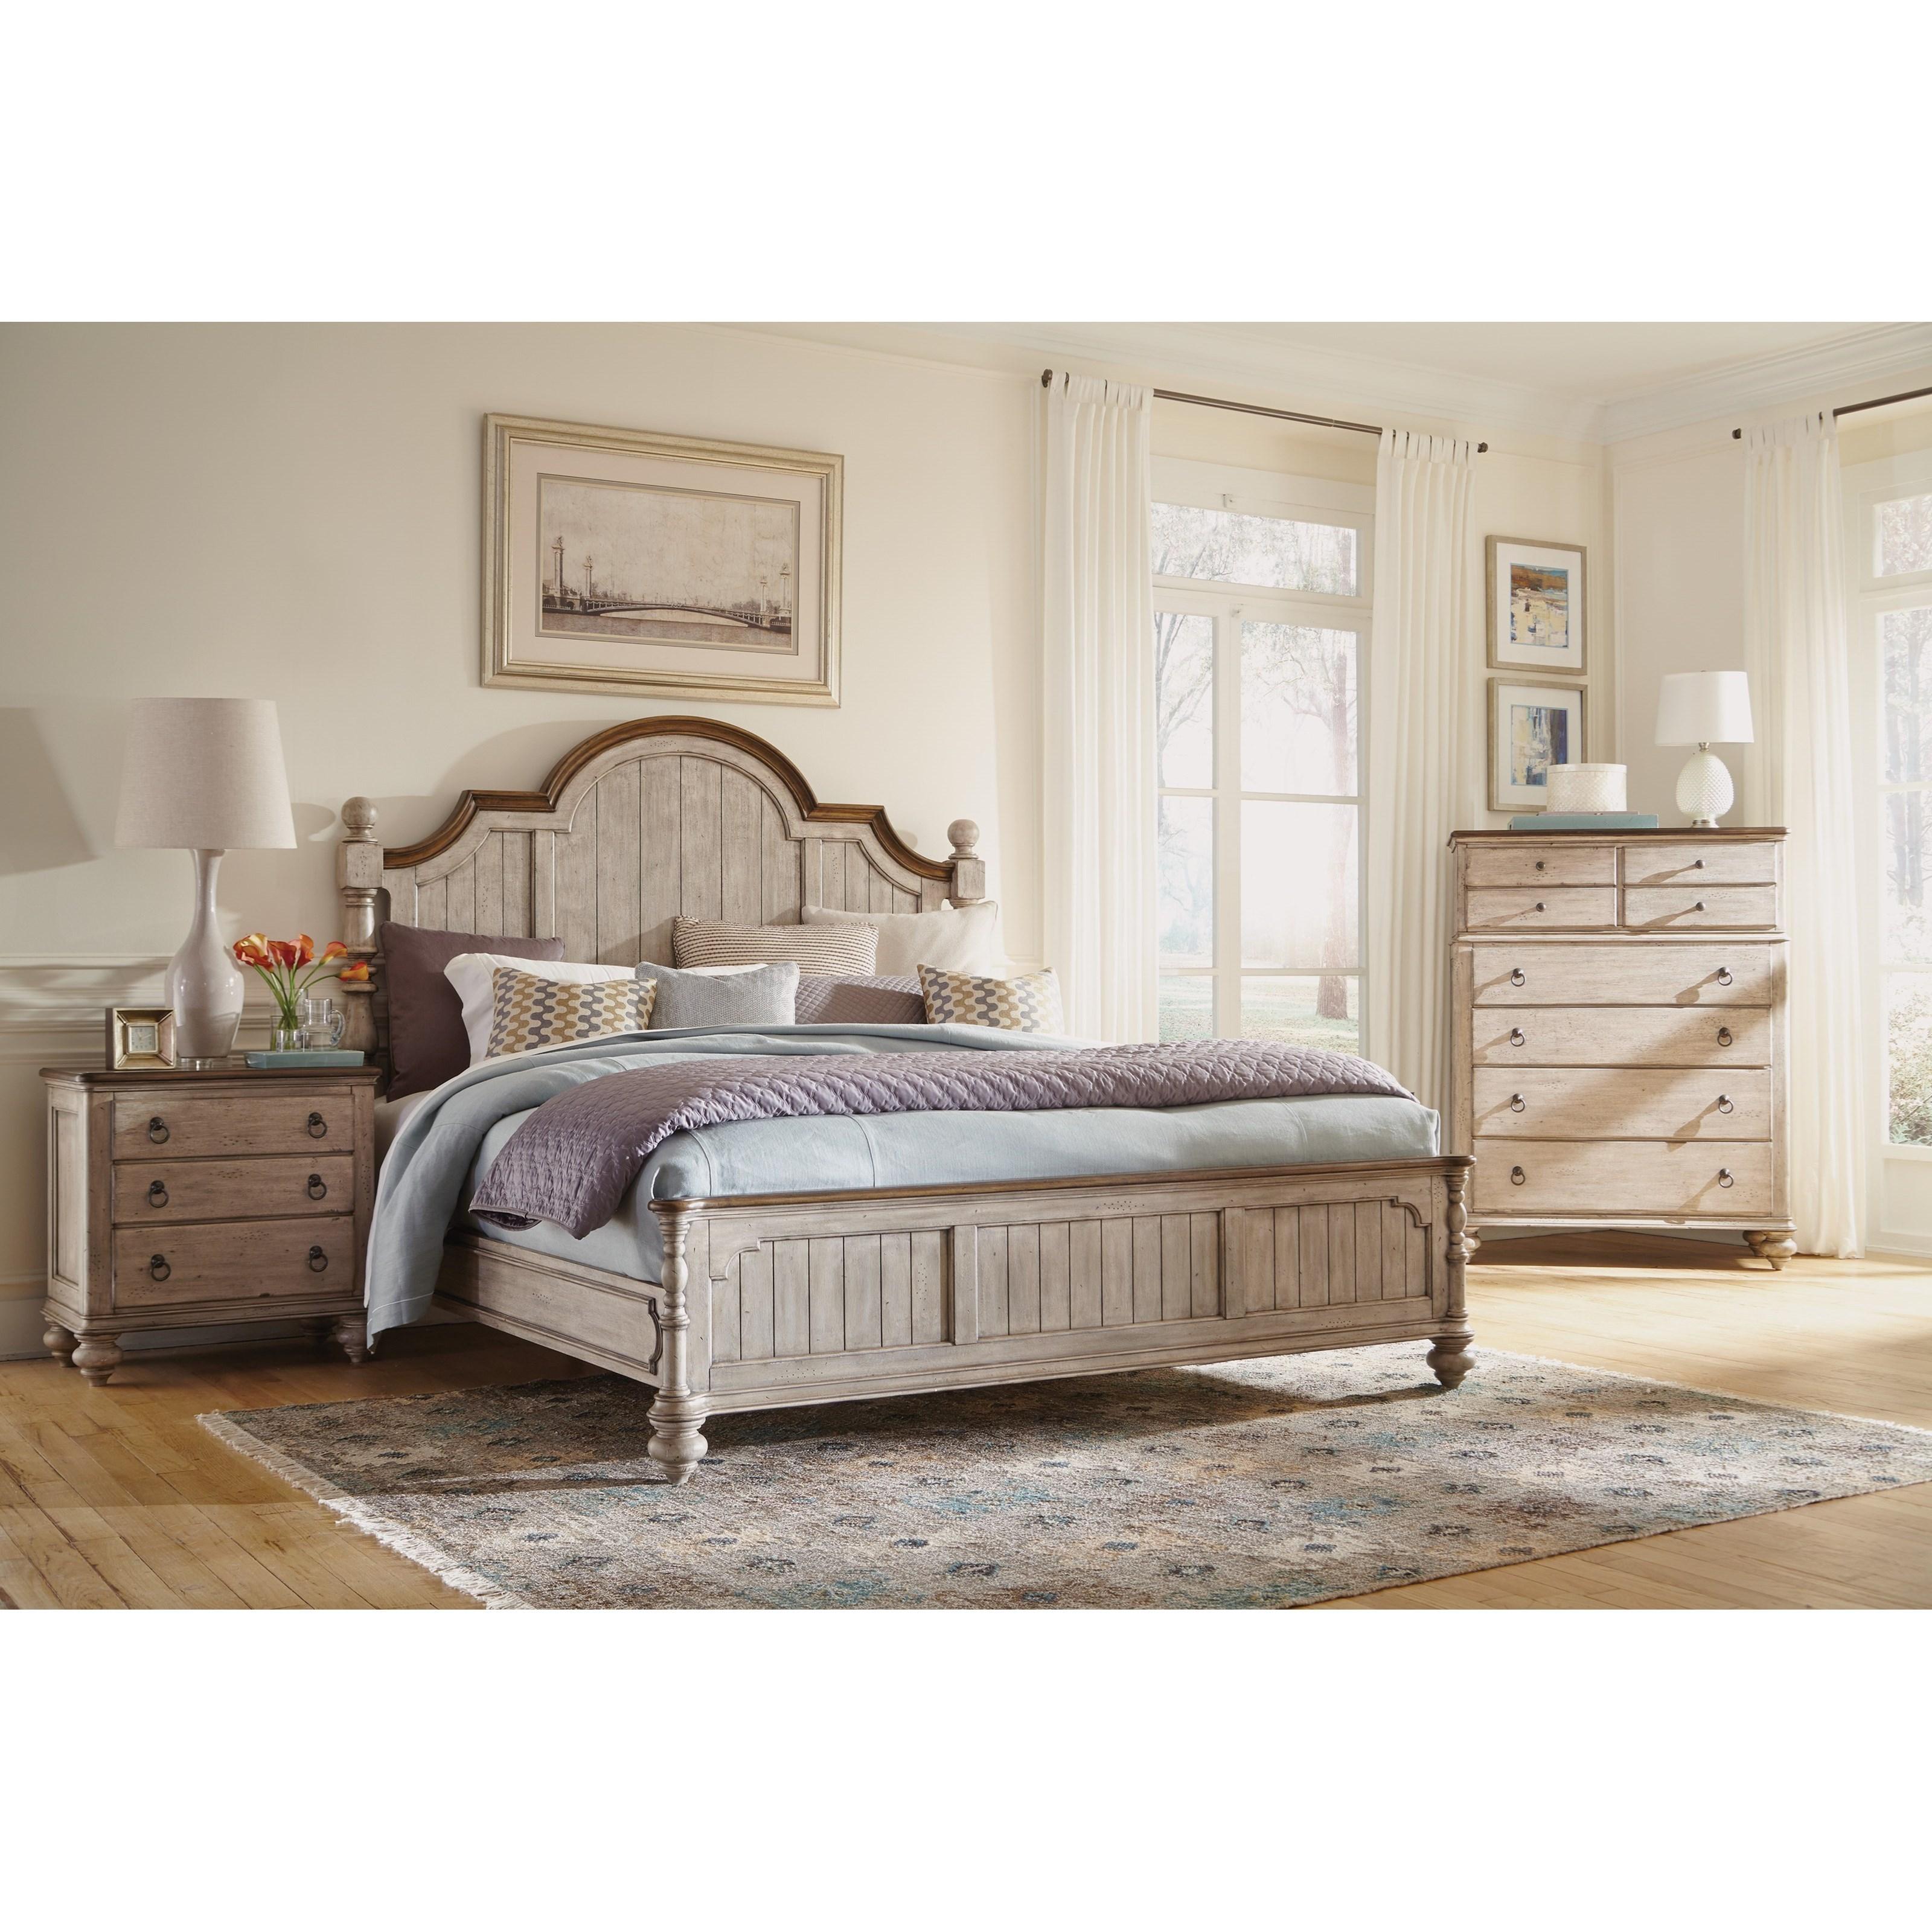 Flexsteel Wynwood Collection Plymouth Queen Bedroom Group